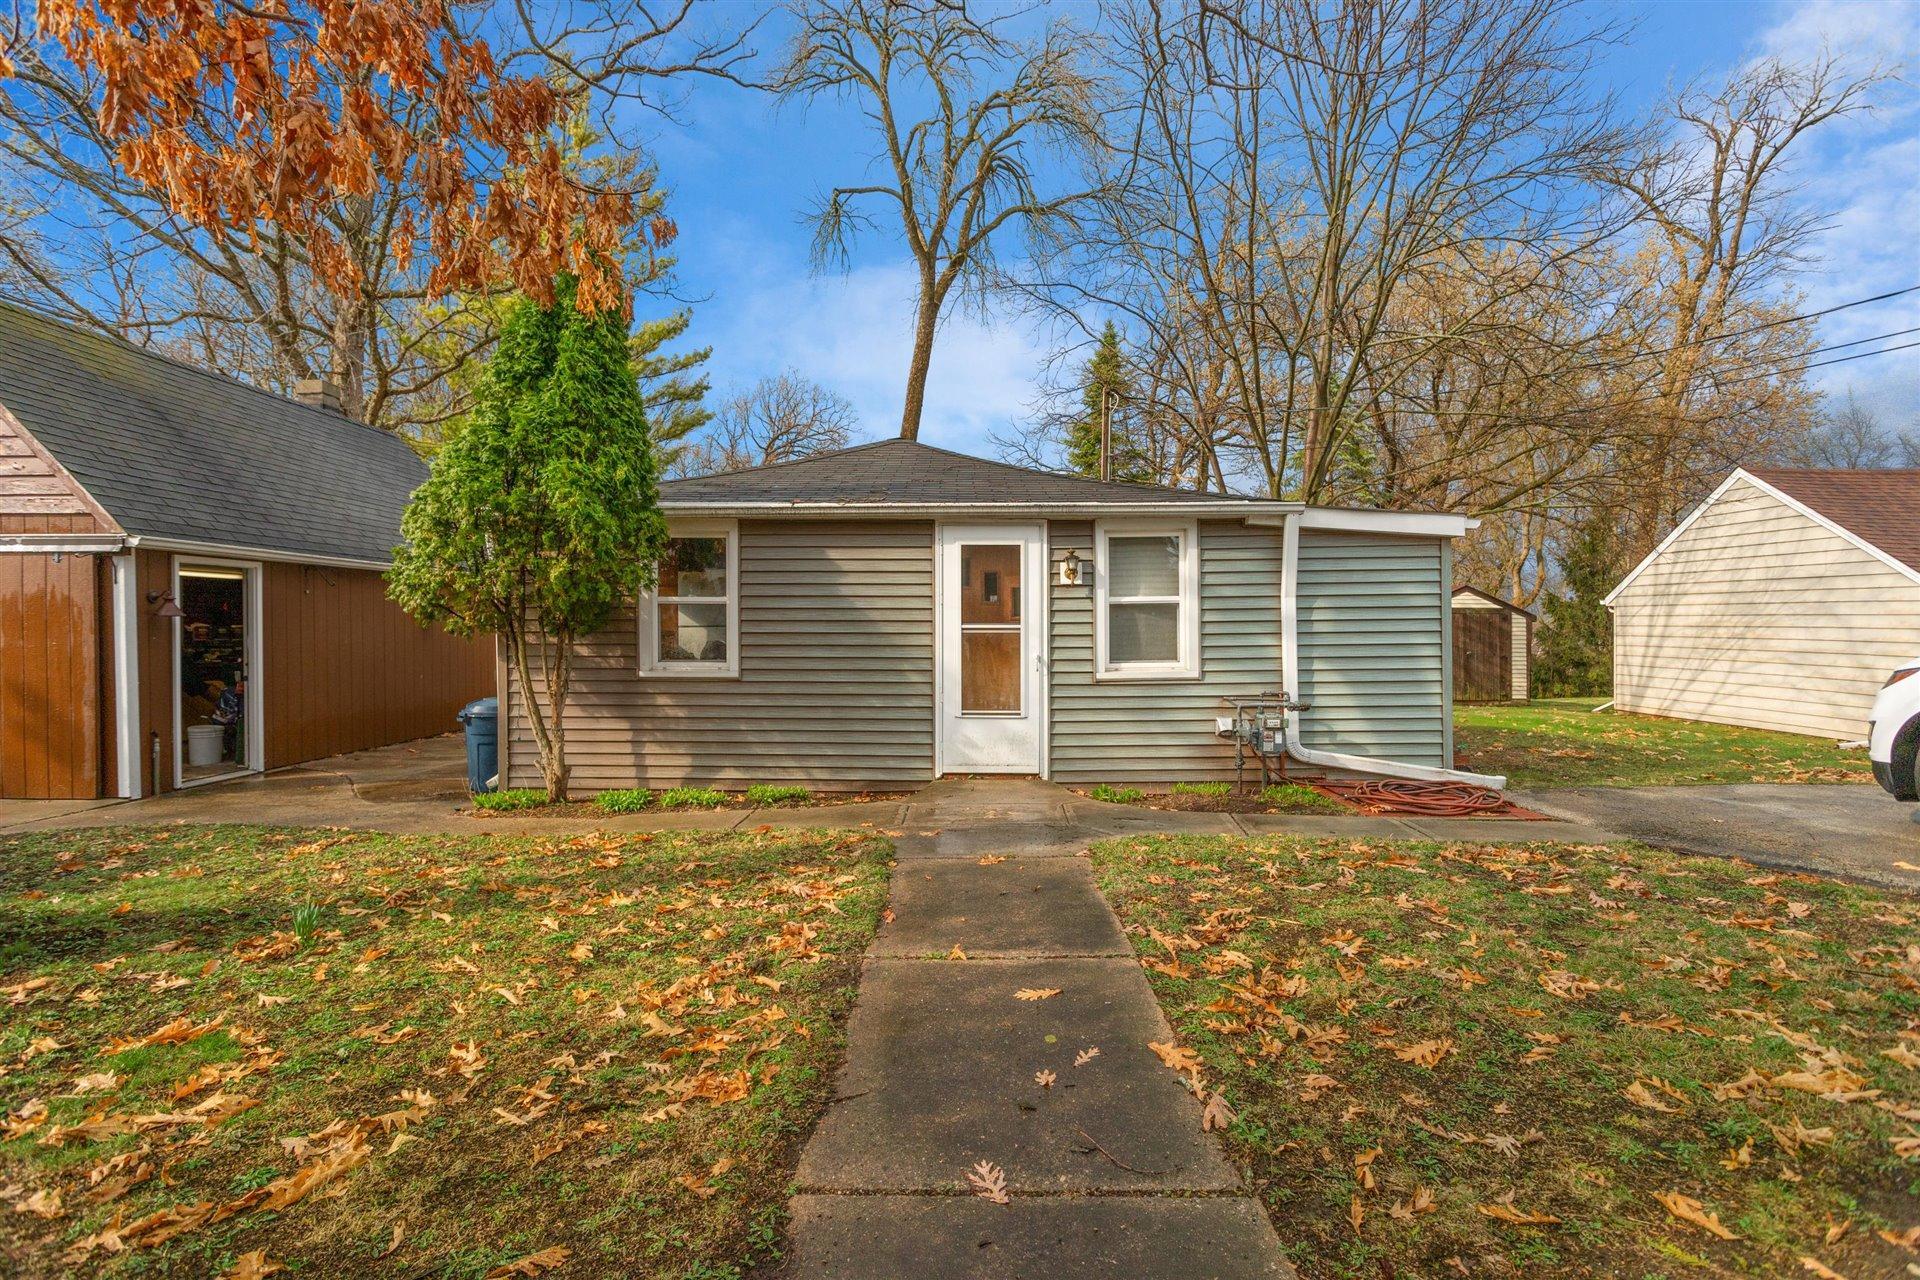 N22W28818 Oak Ln, Delafield, Wisconsin 53072, 2 Bedrooms Bedrooms, 4 Rooms Rooms,1 BathroomBathrooms,Single-Family,For Sale,Oak Ln,1731631